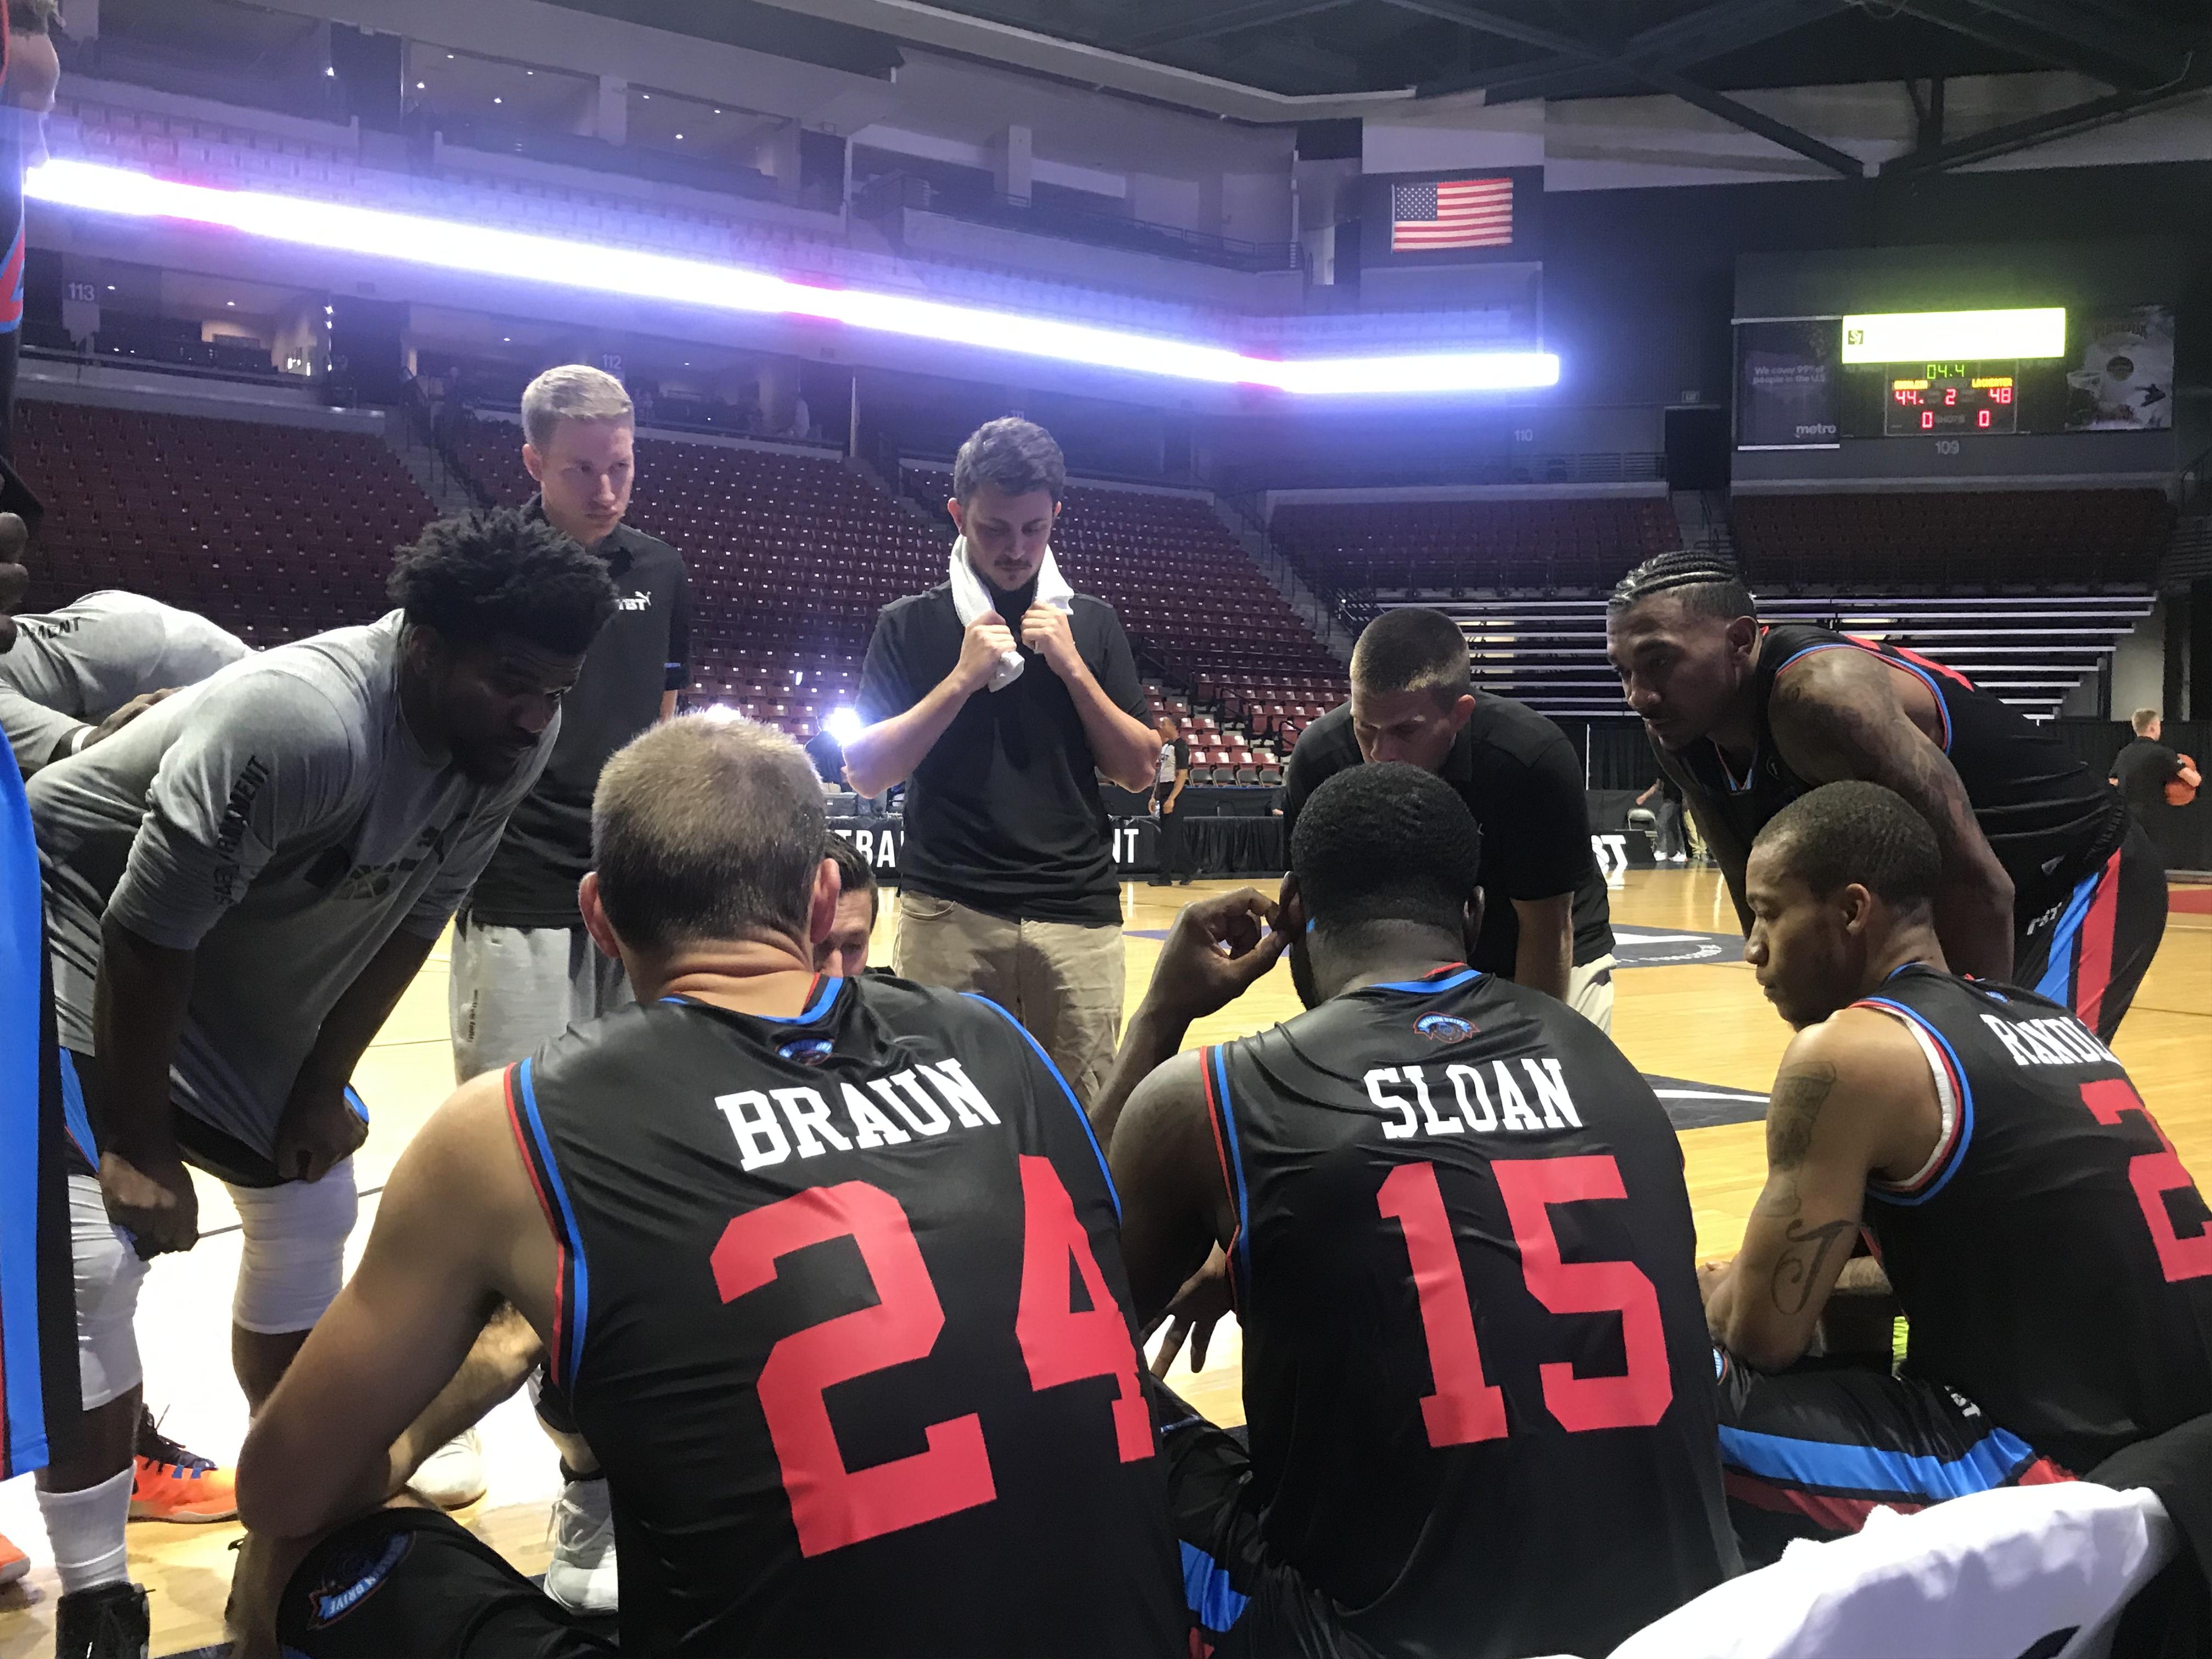 Coverage: The Basketball Tournament's (TBT) Salt Lake Regional with Eberlein Drive